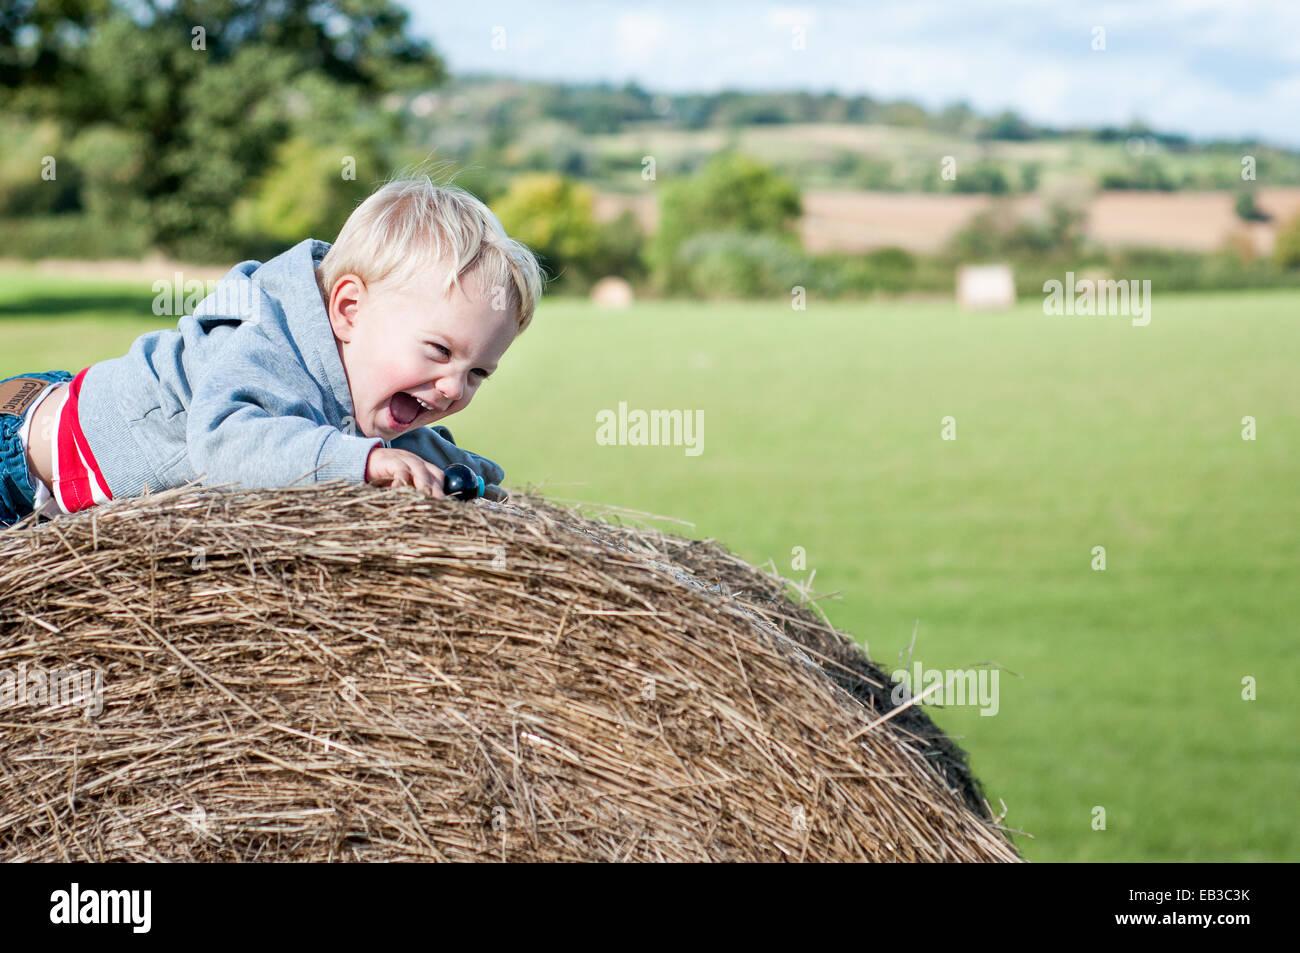 Boy crawling on hay bale laughing - Stock Image